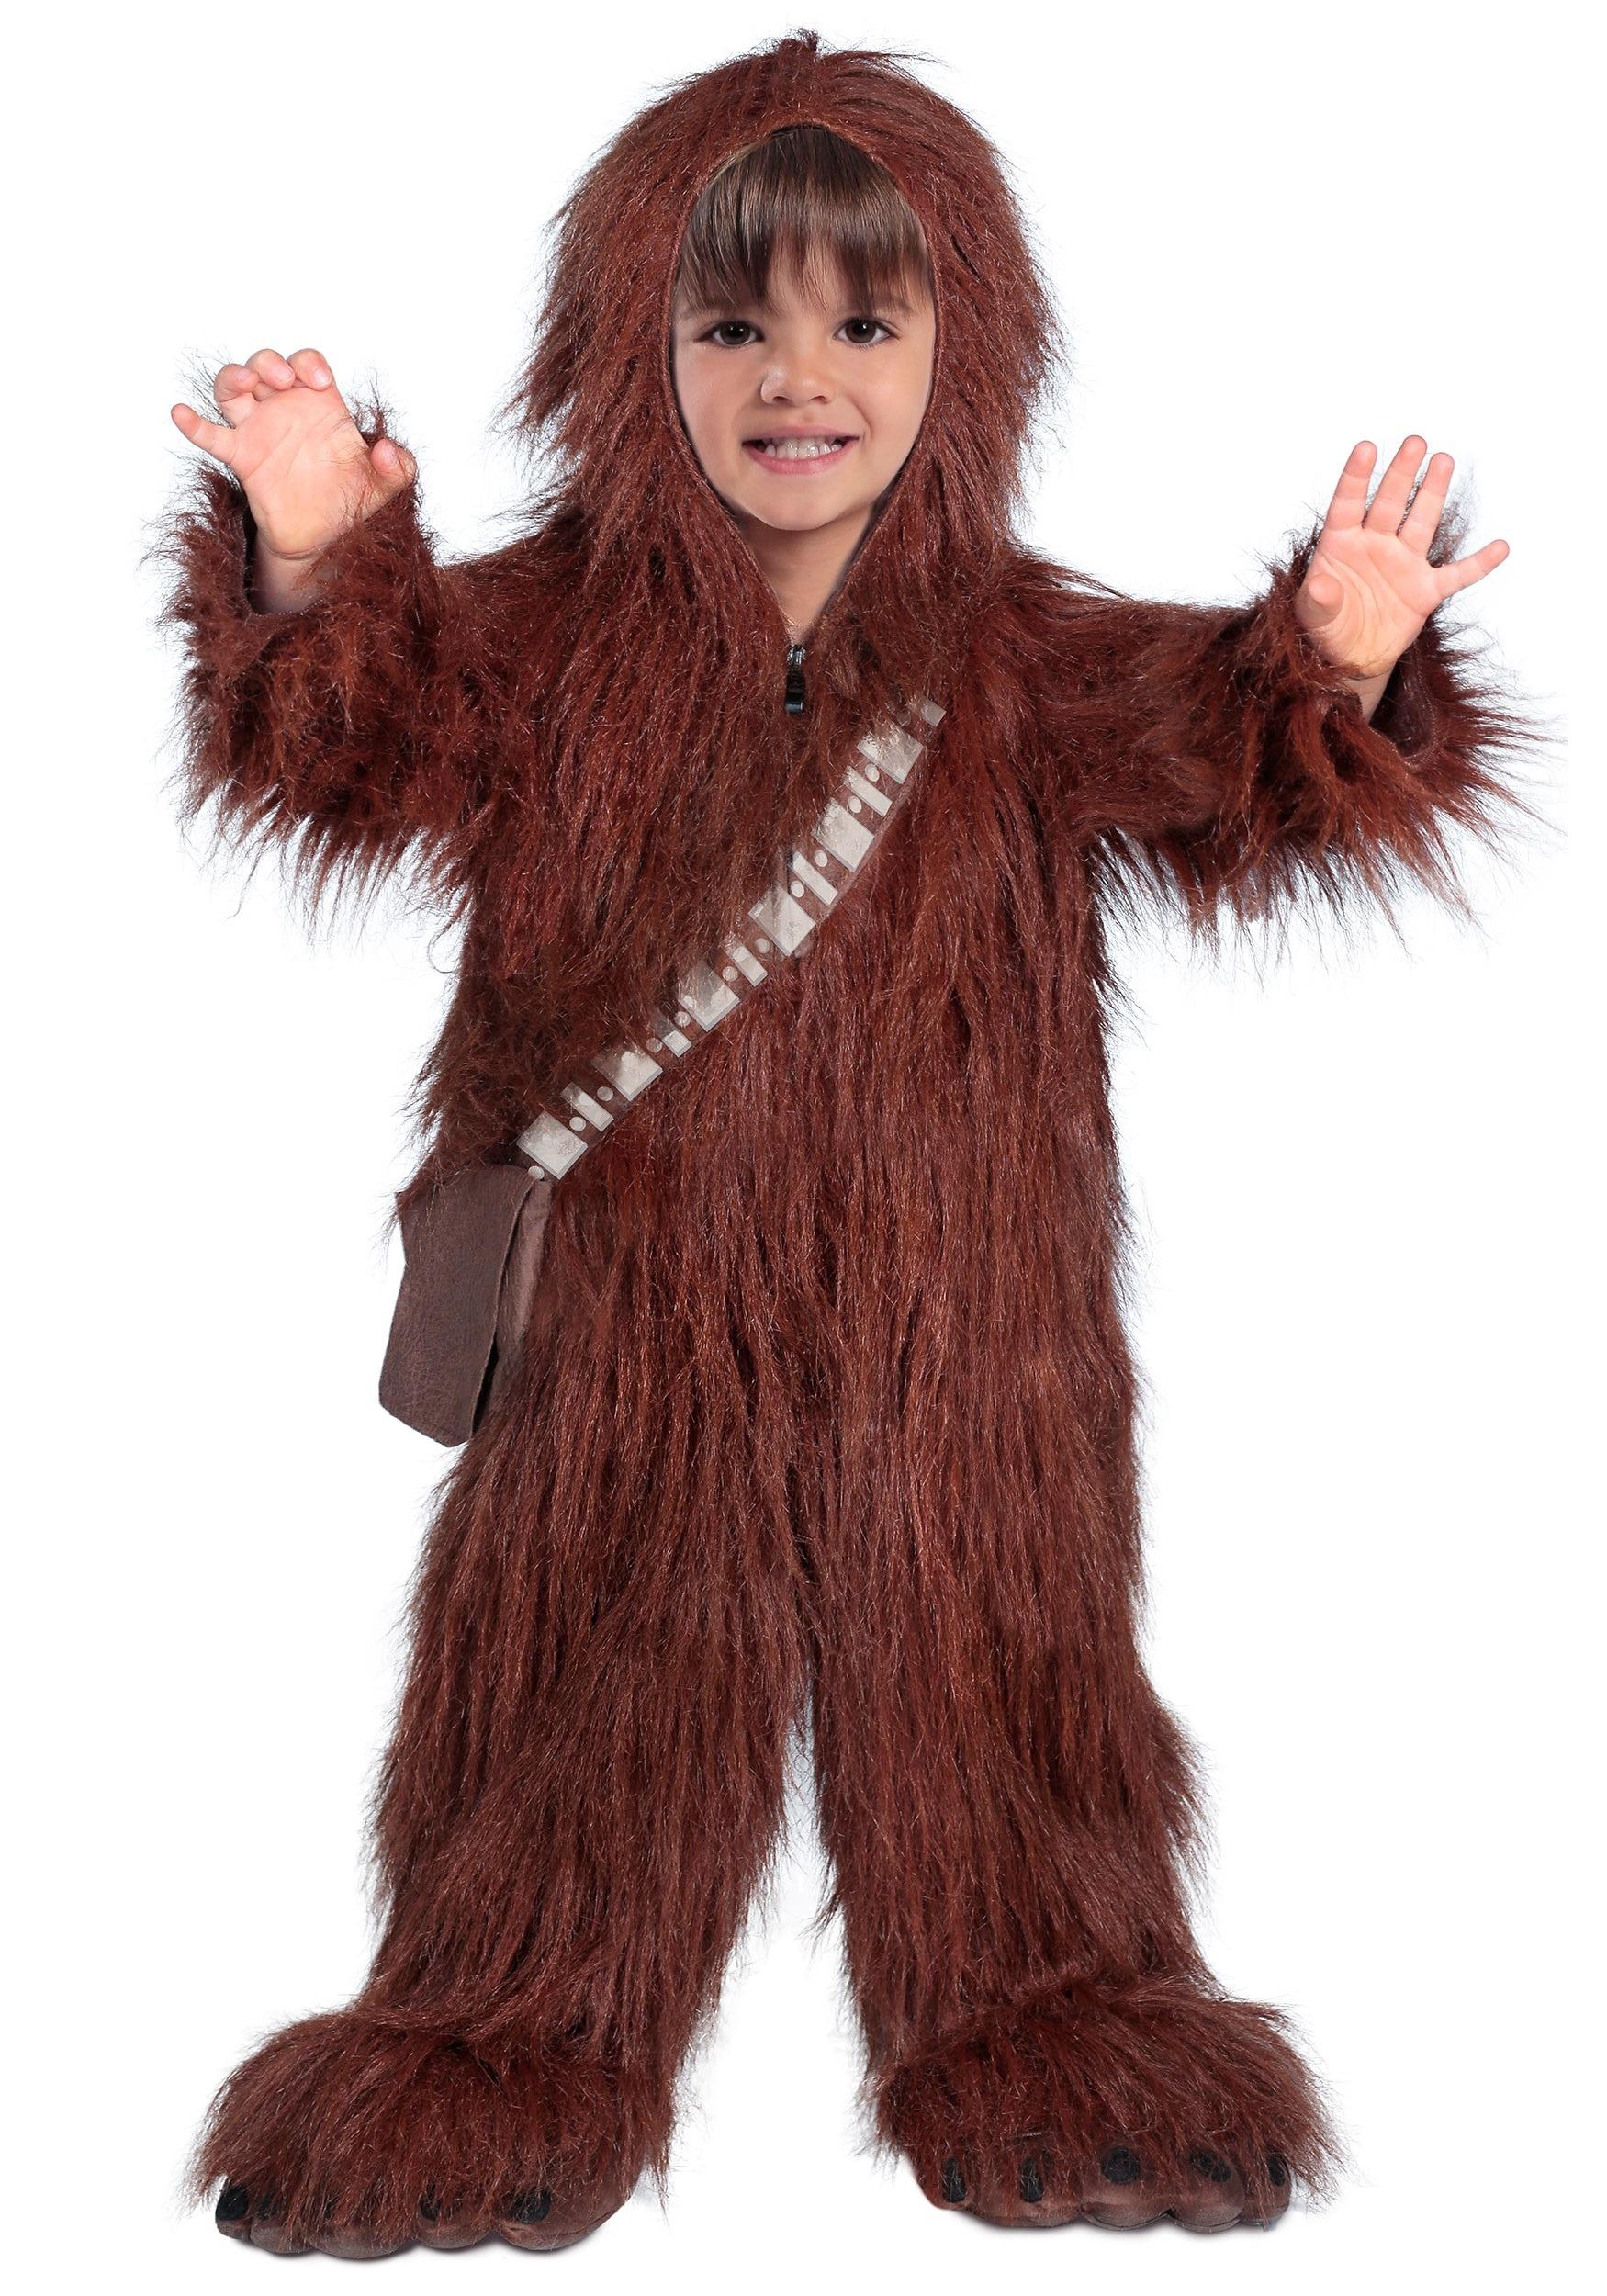 ... Deluxe Chewbacca Toddler Costume  sc 1 st  Fun.com & Deluxe Chewbacca Costume for Toddlers